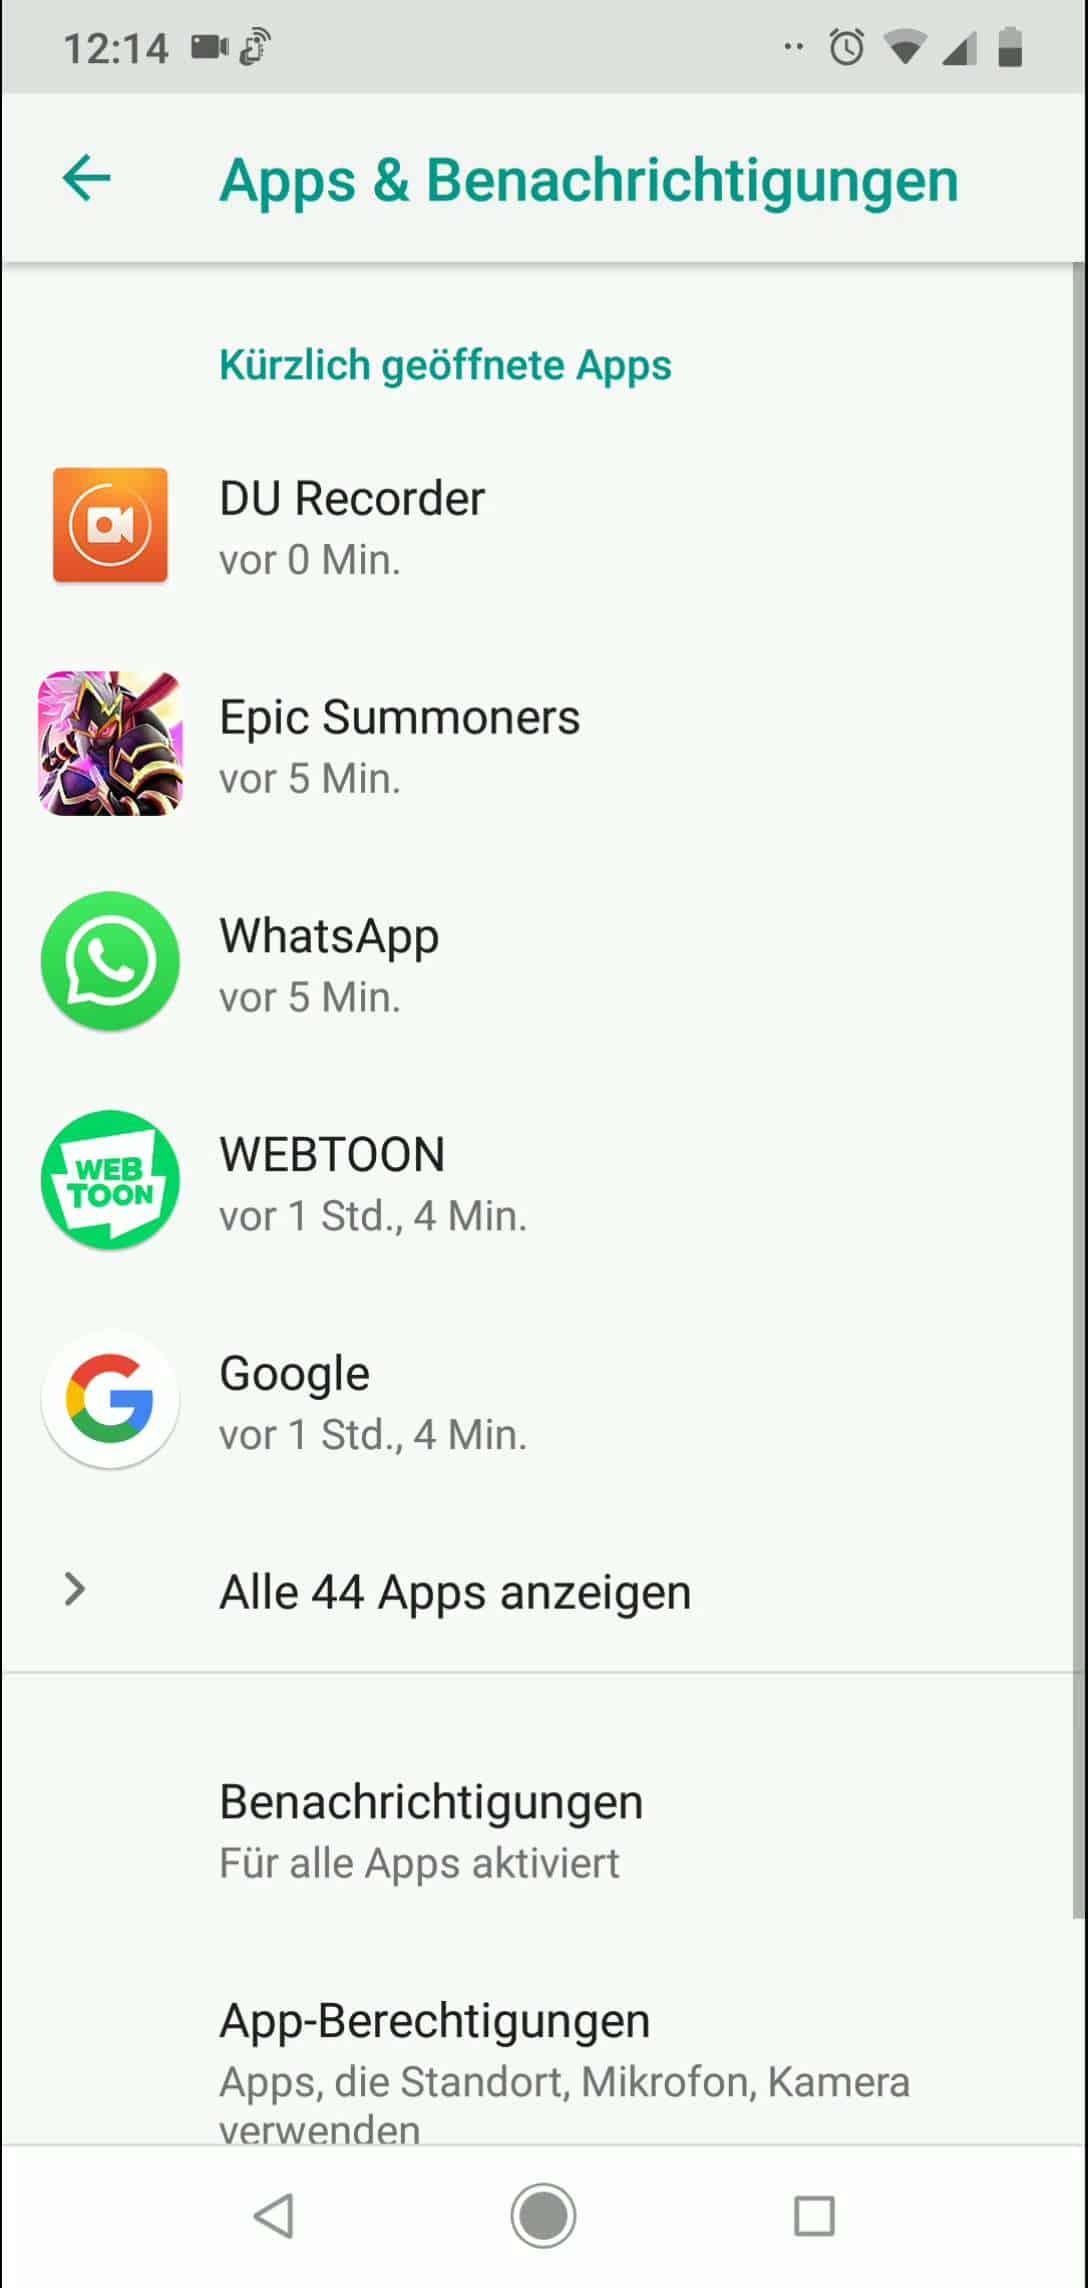 Schritt 3: Tippe auf App-Berechtigungen